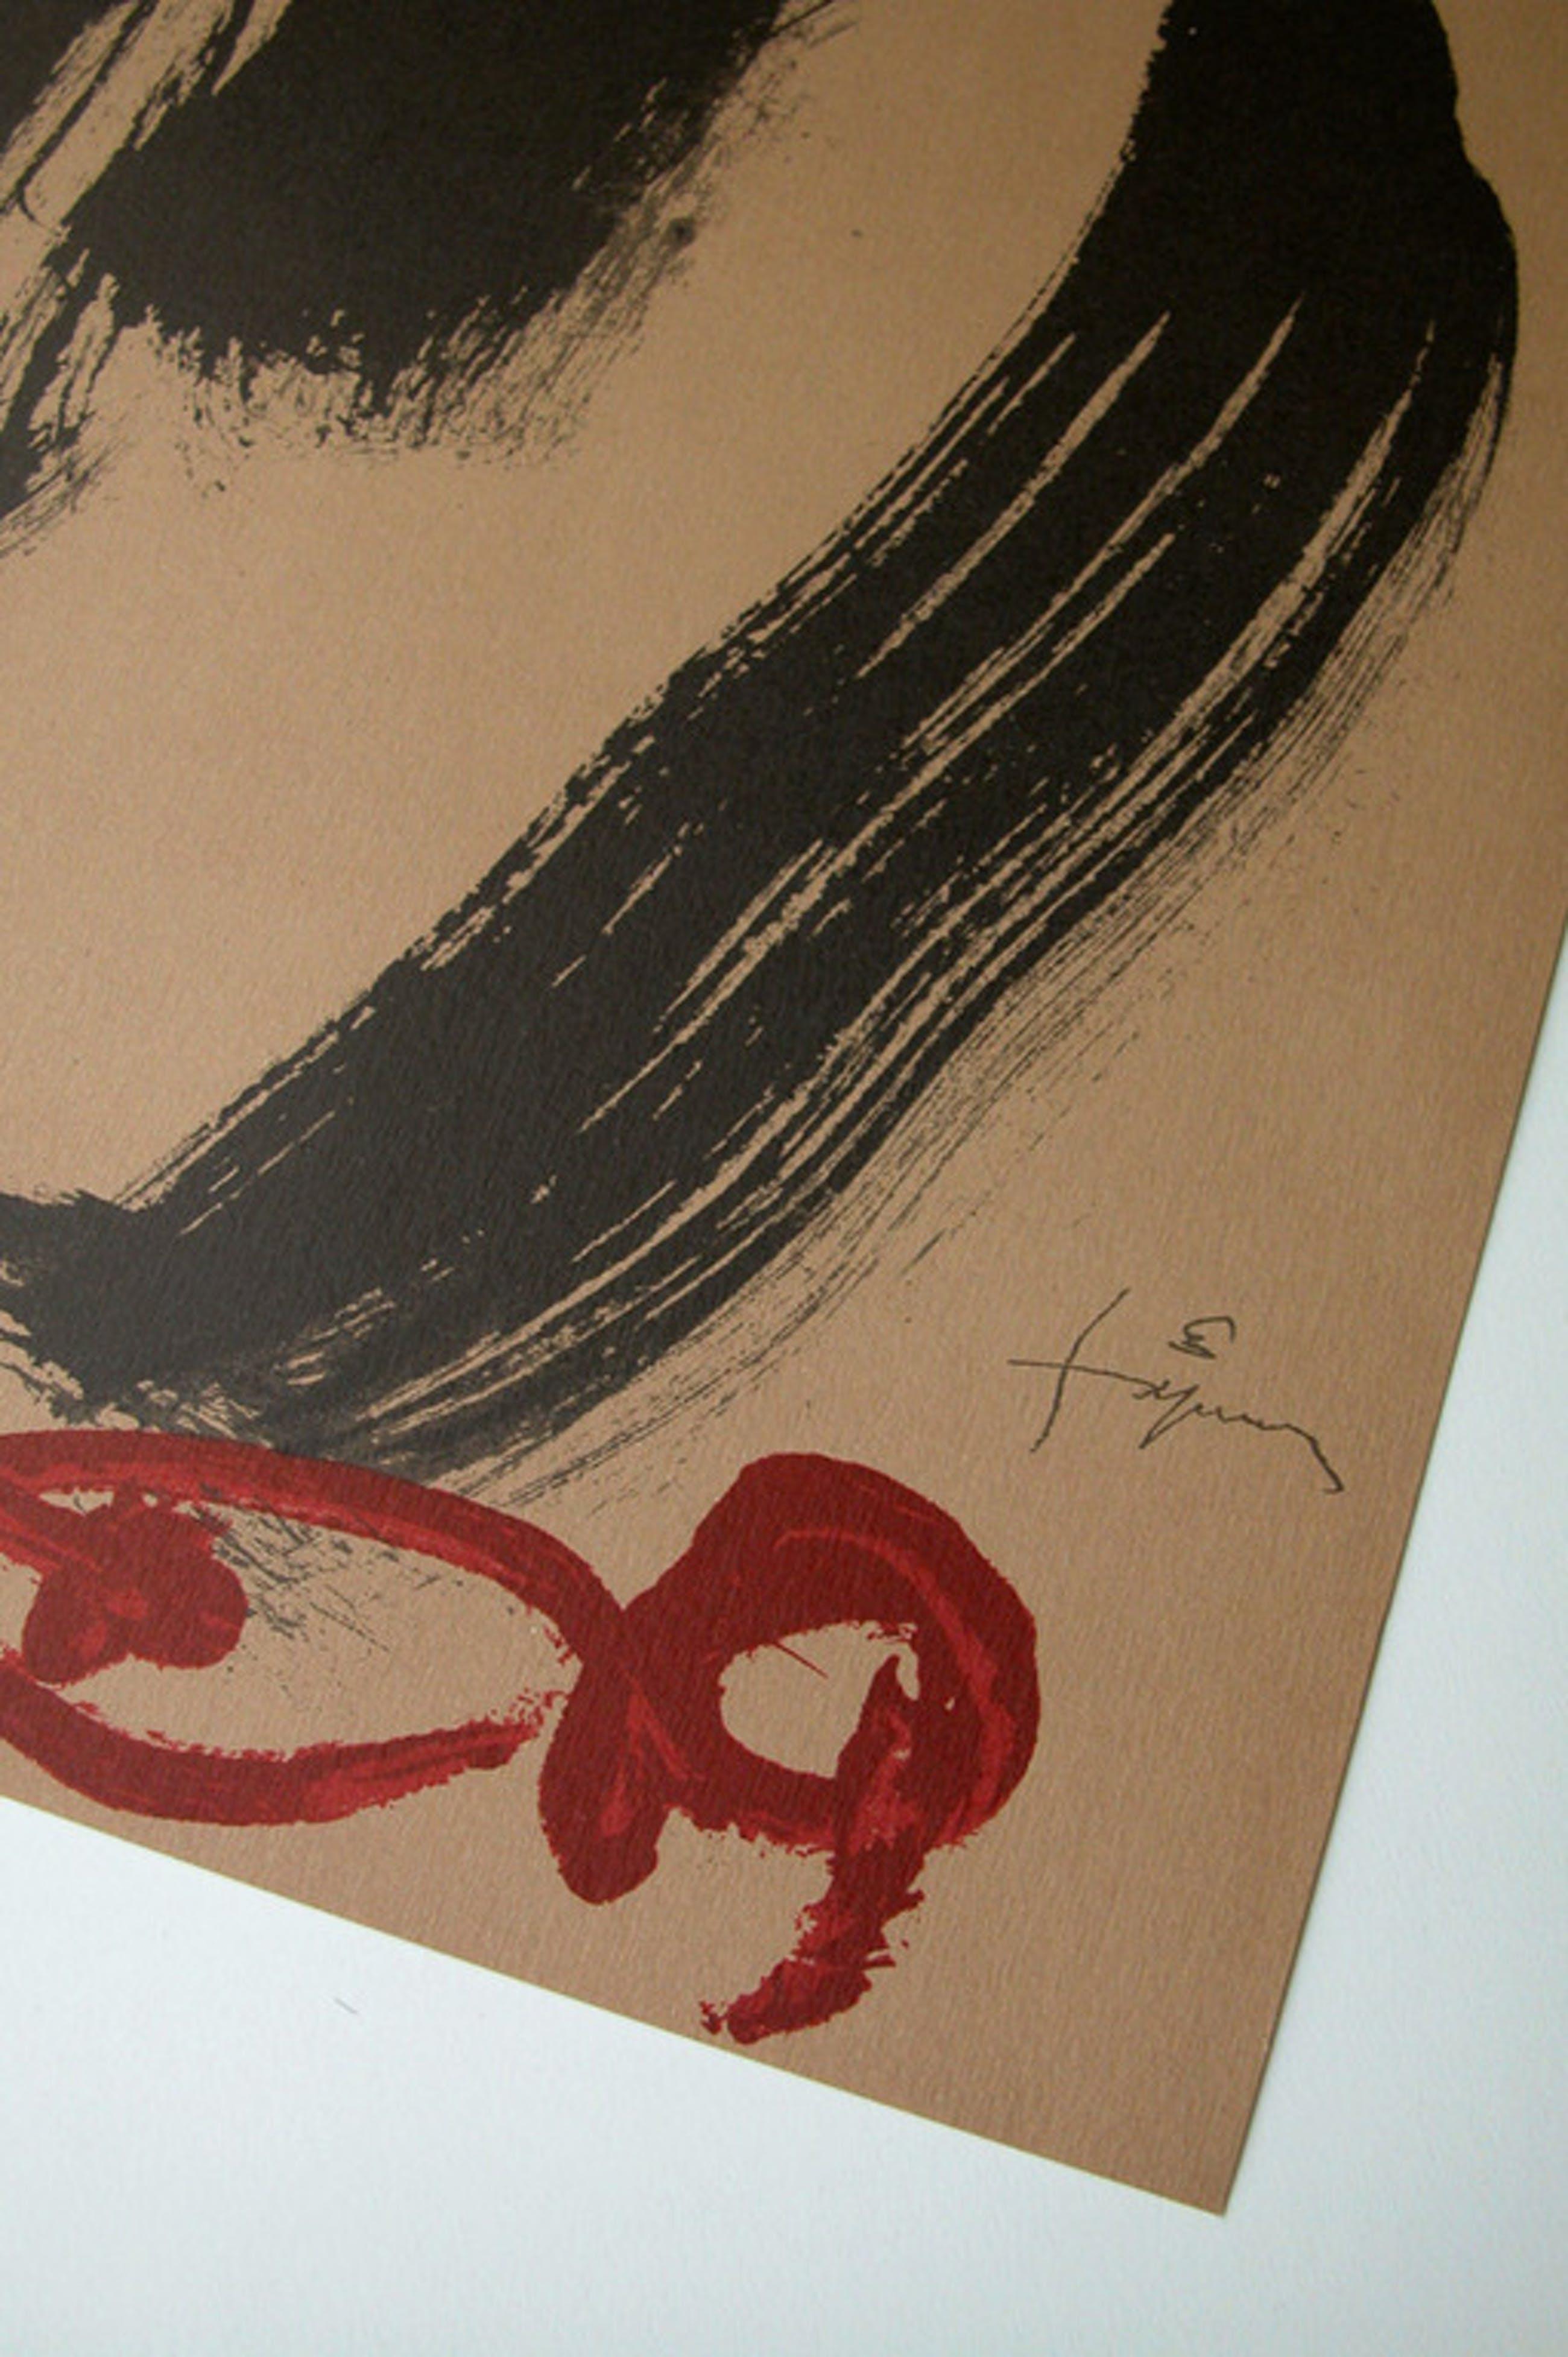 Antoni Tapies, 'Creu i M', lithografie, 1999, handgenummerd, ed. 1000  kopen? Bied vanaf 75!